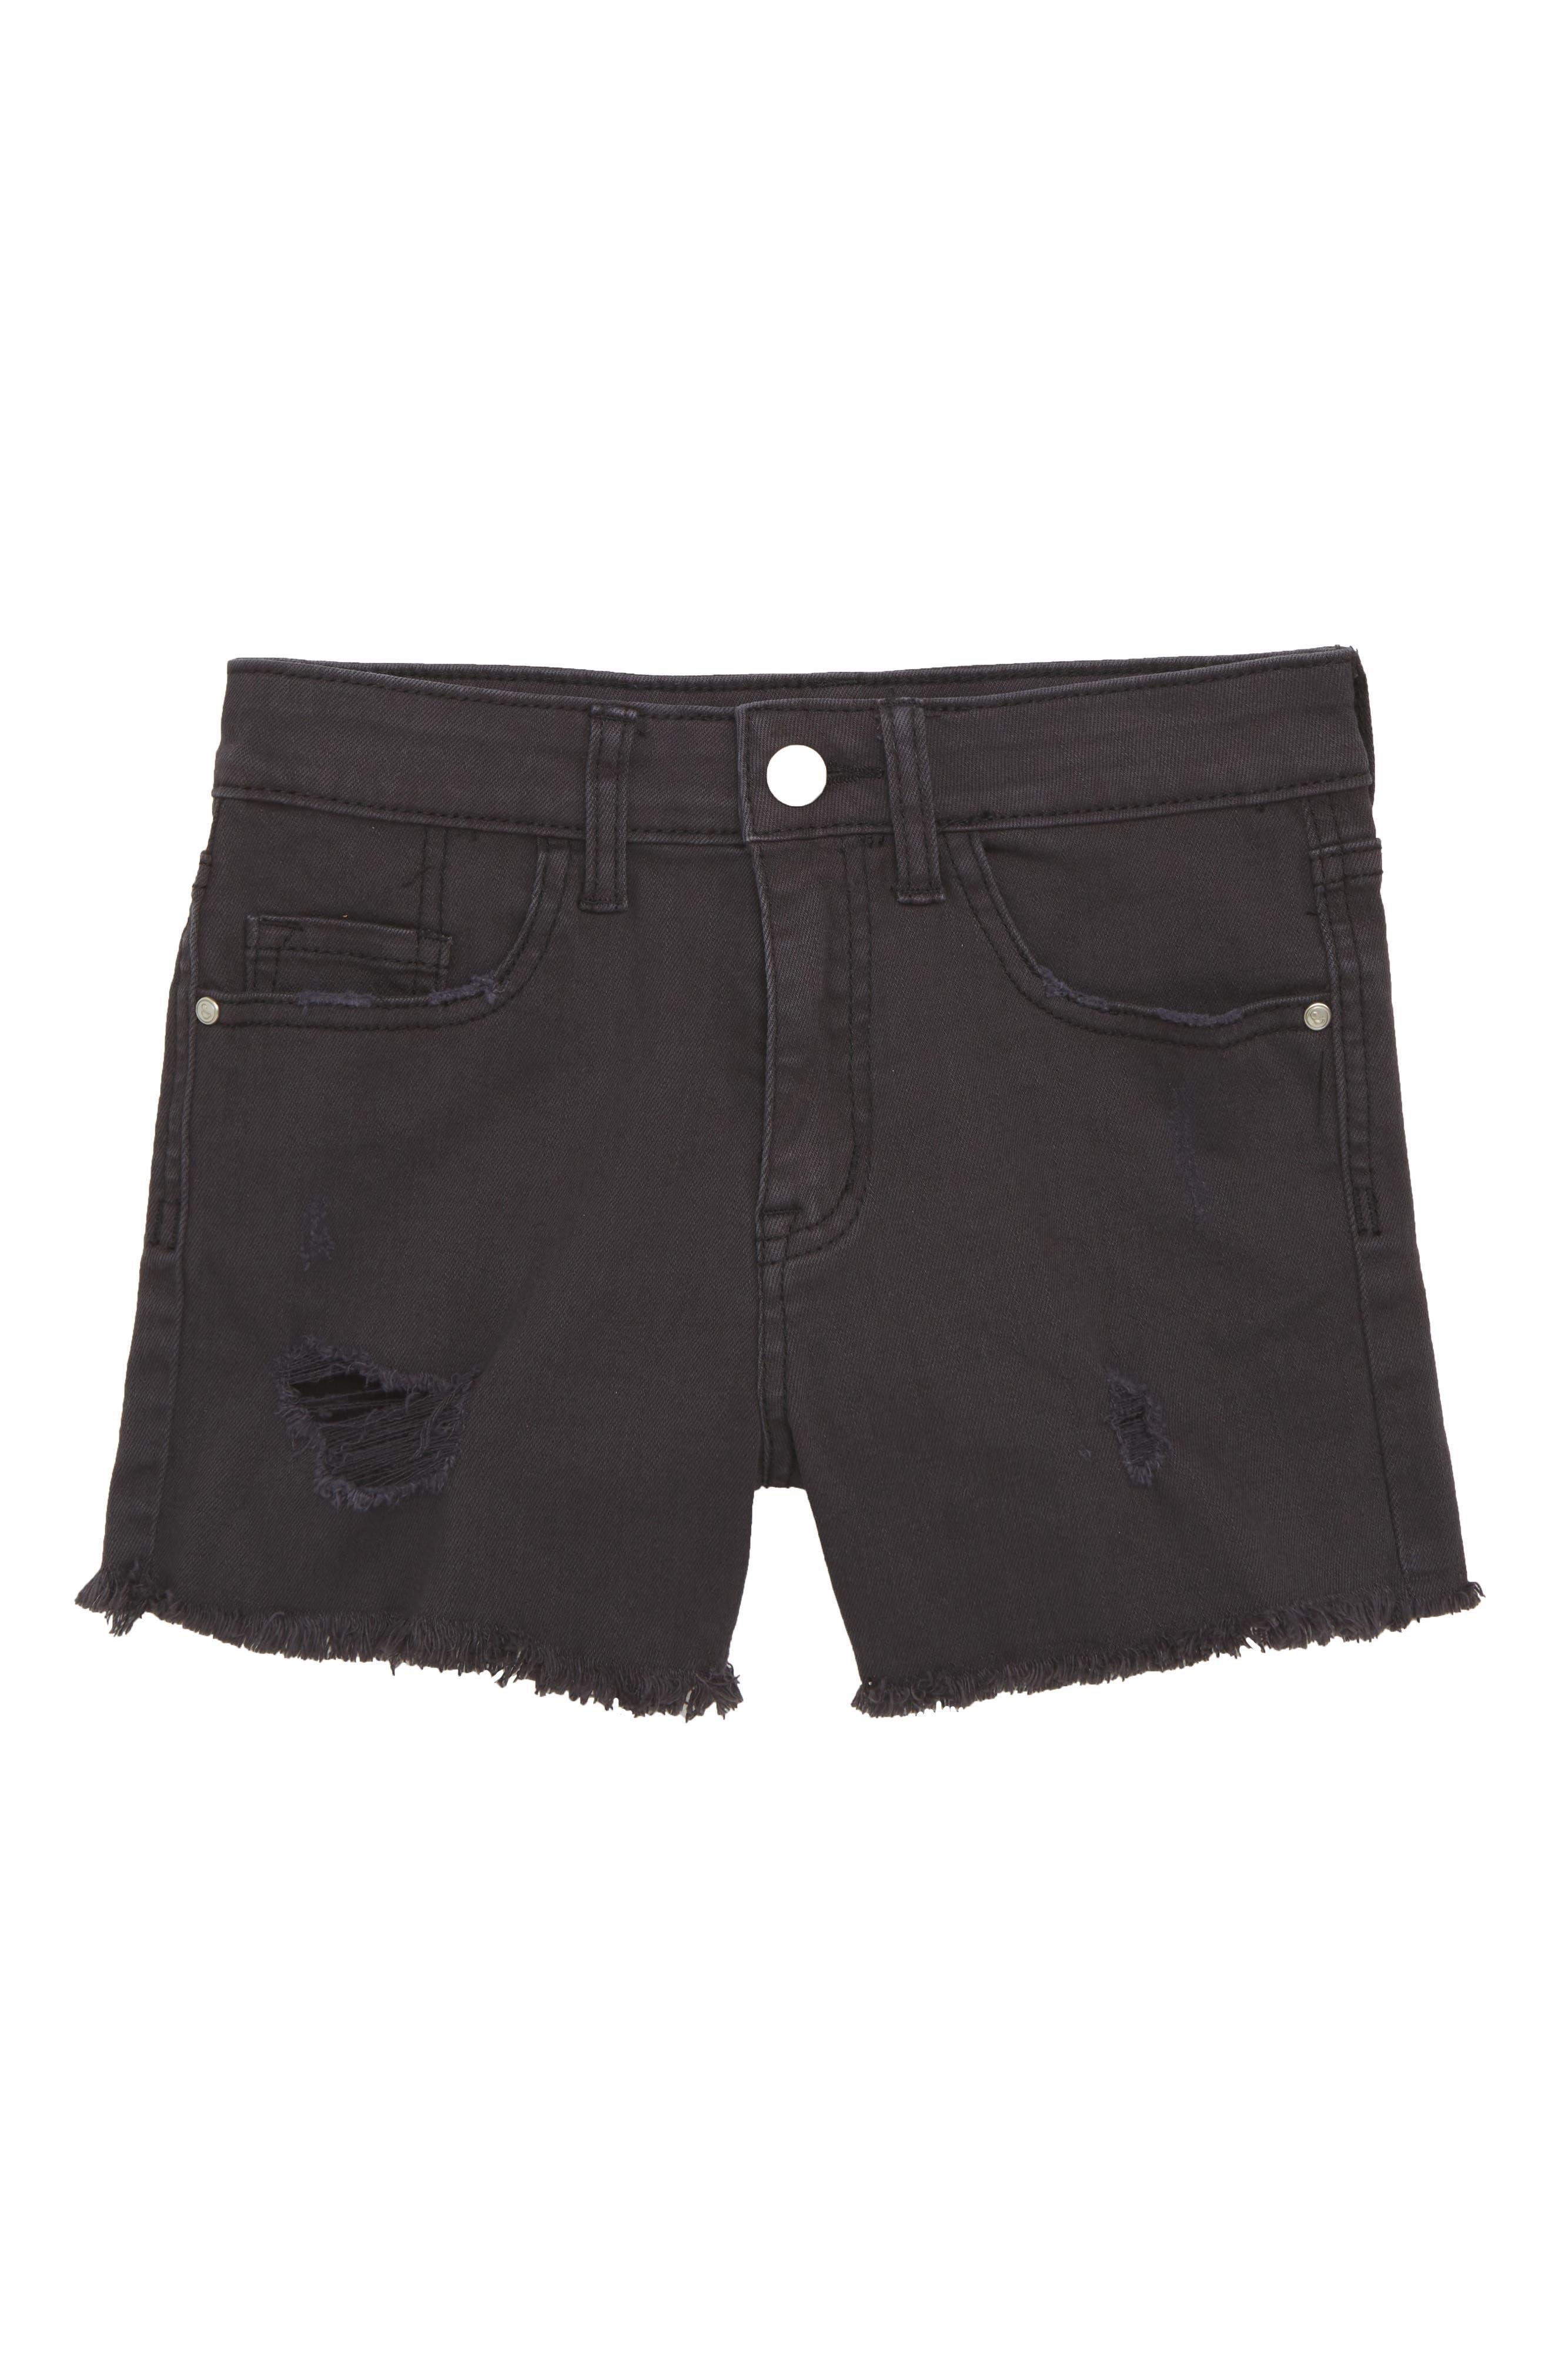 Distressed Cutoff Denim Shorts,                             Main thumbnail 1, color,                             BLACK